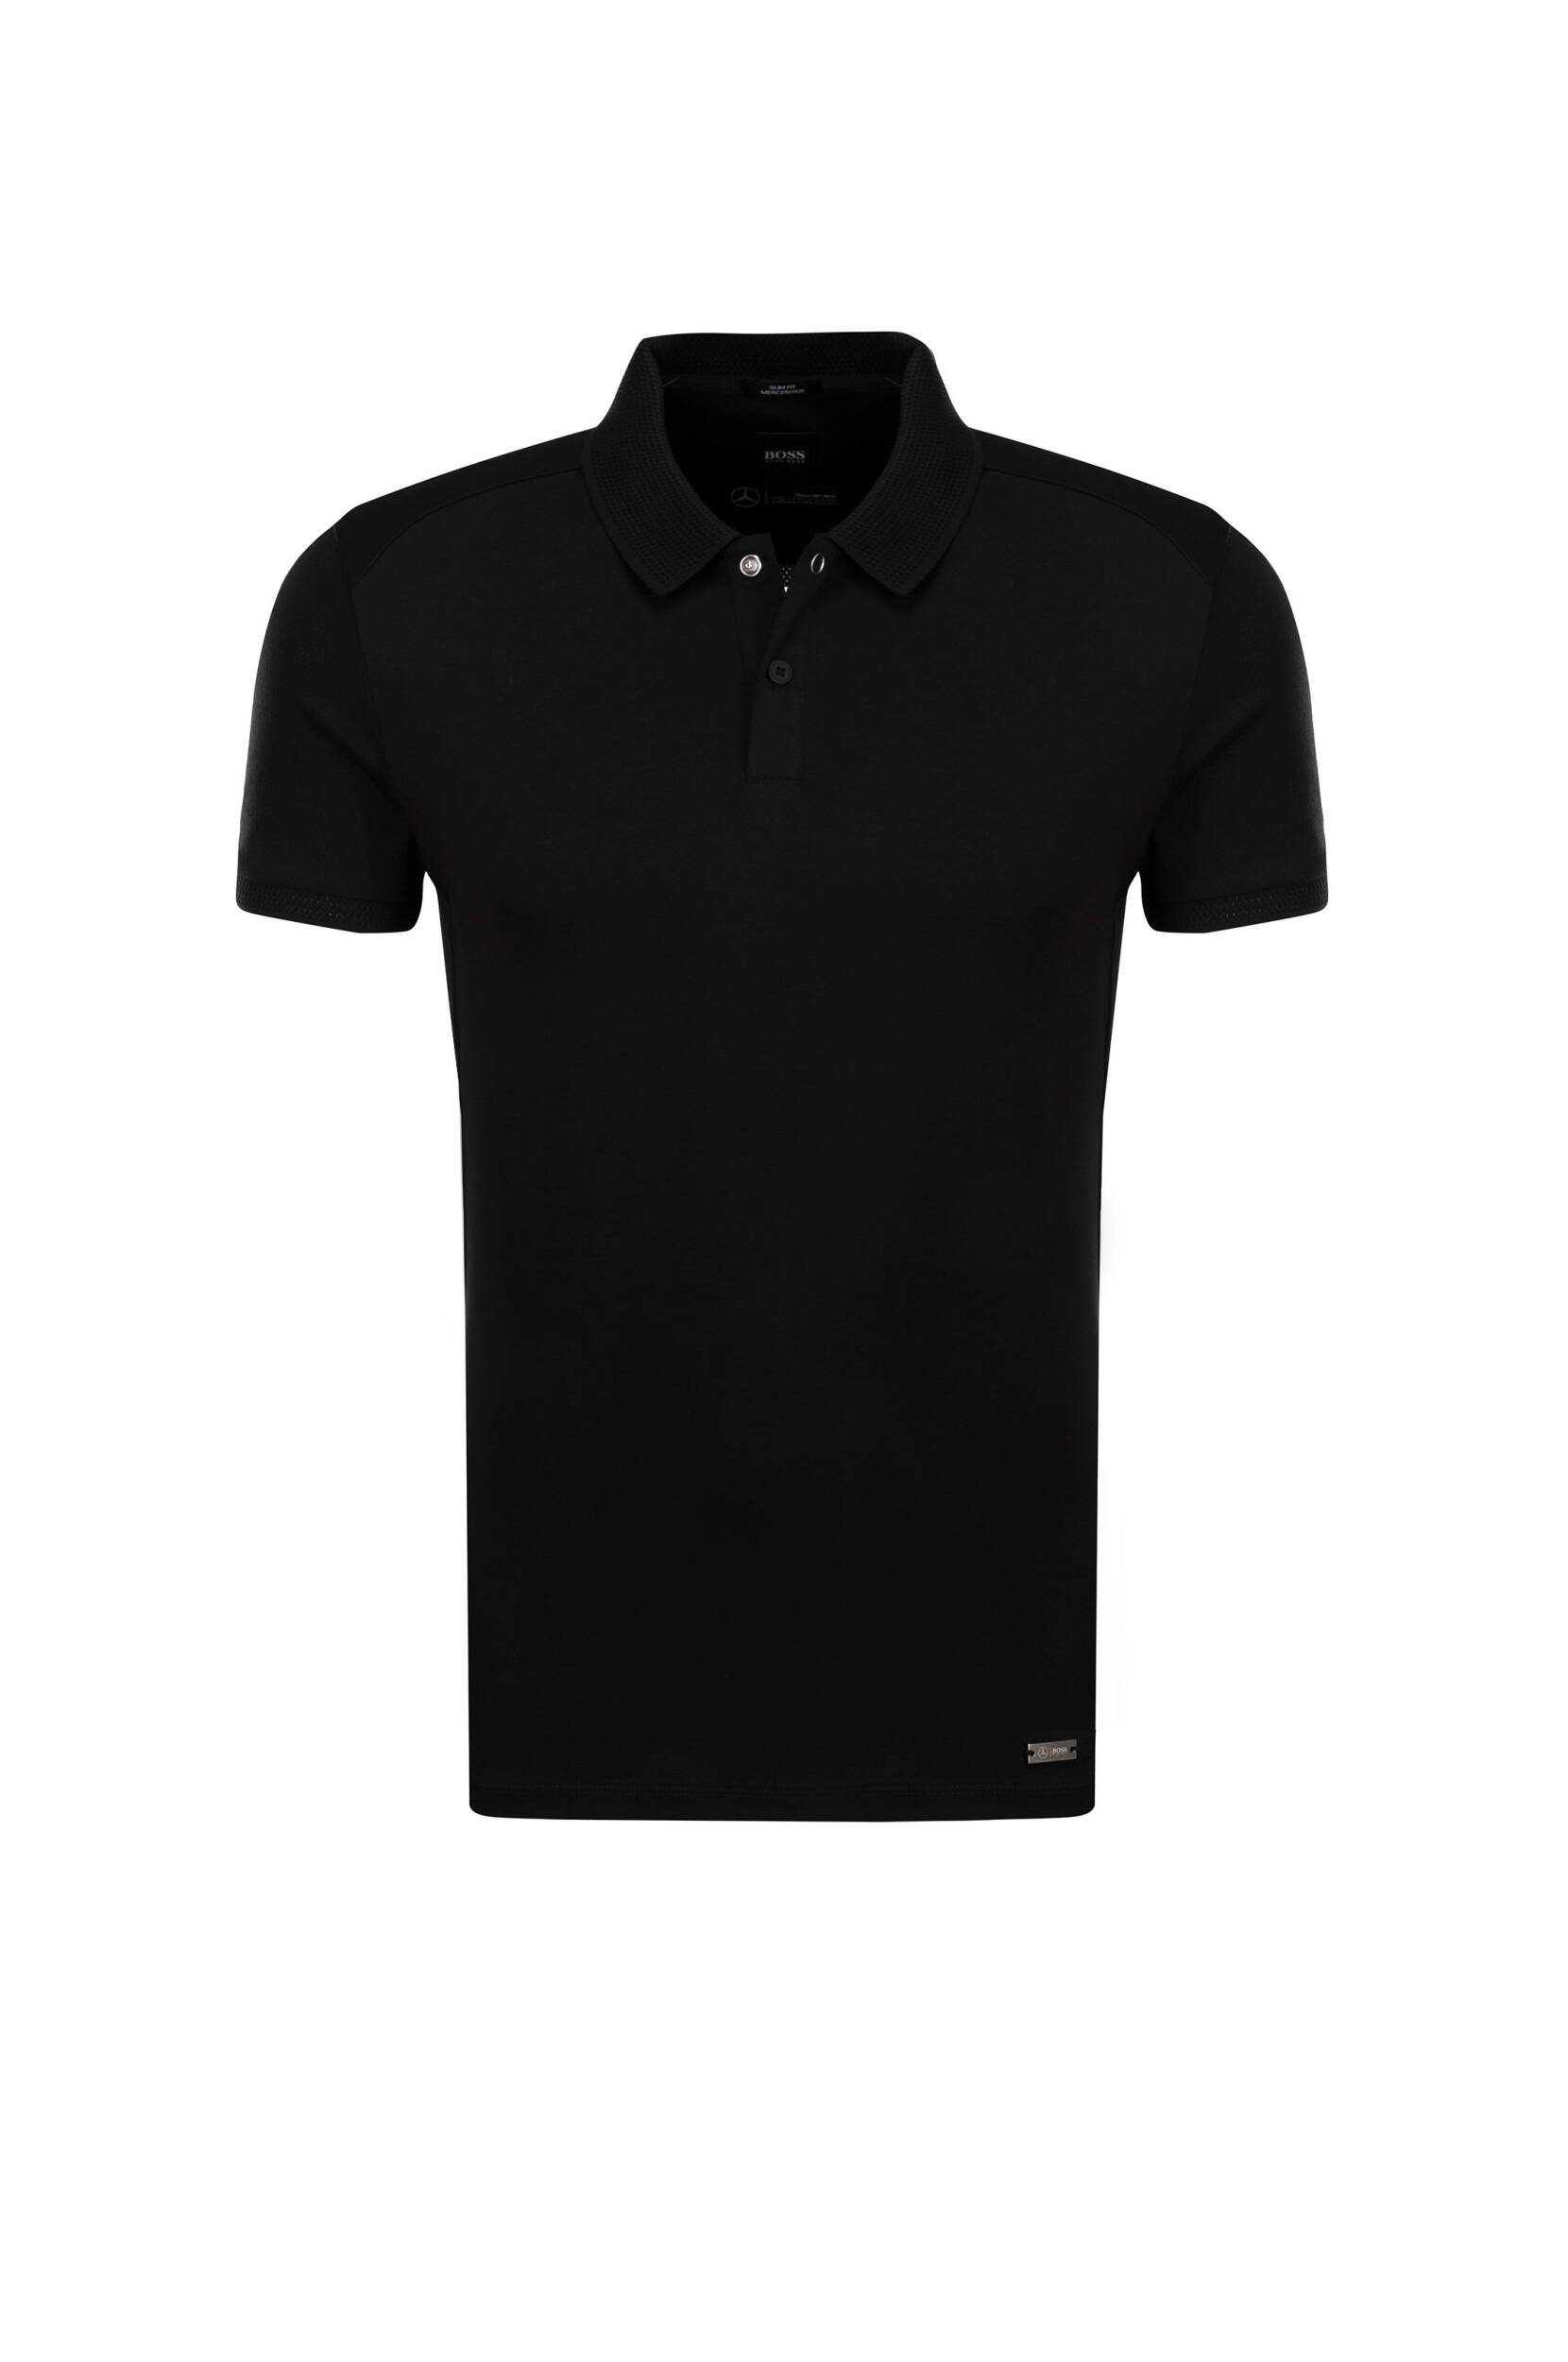 benz jimmy maserati la product sleeve choice martina shirt shirts owner mercedes by shop white long martini index gear